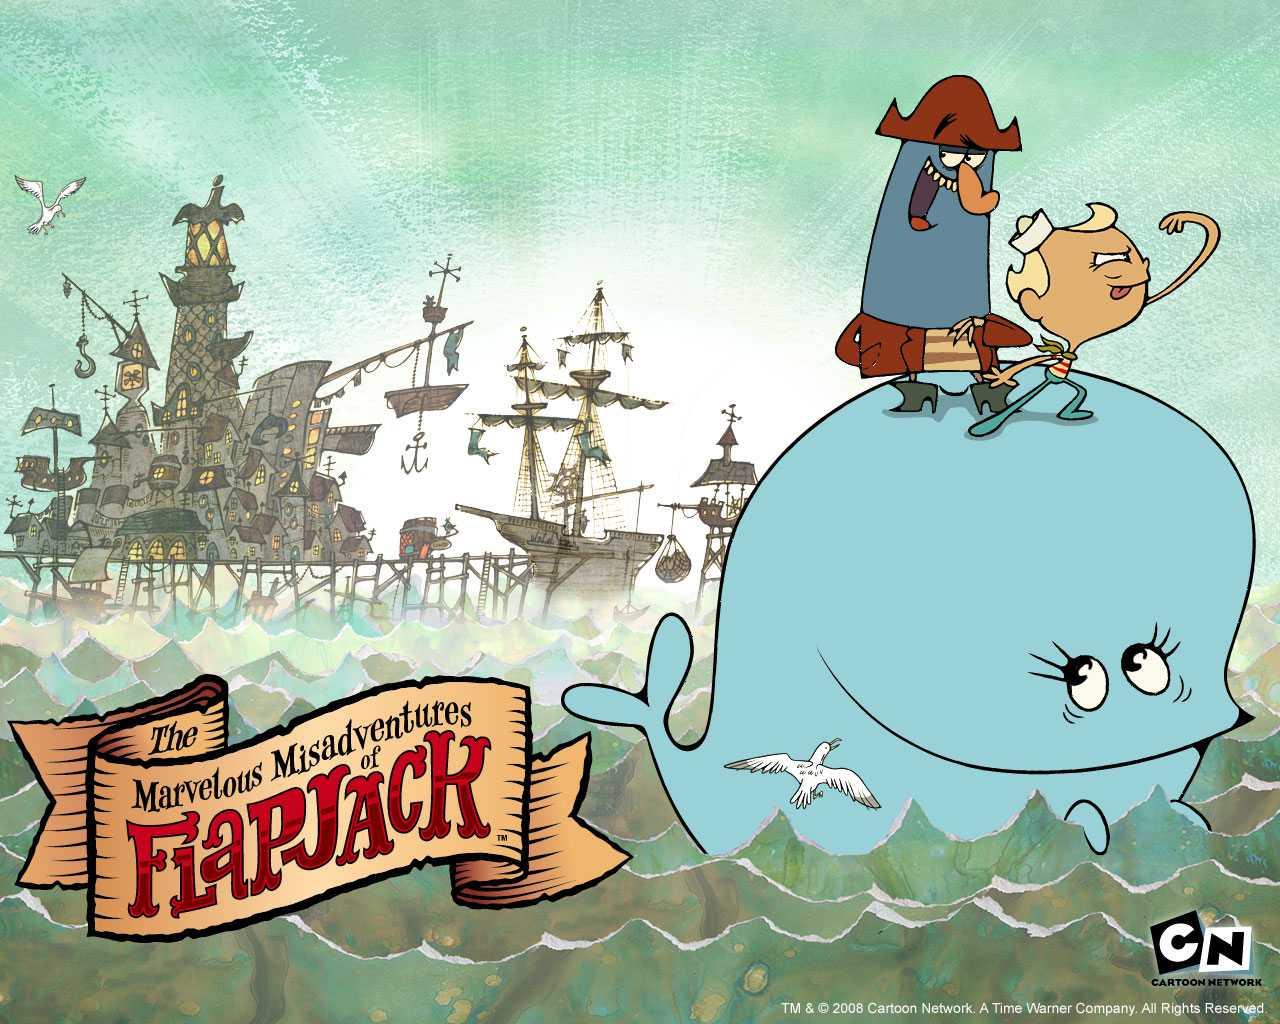 The Marvelous Misadventures of Flapjack